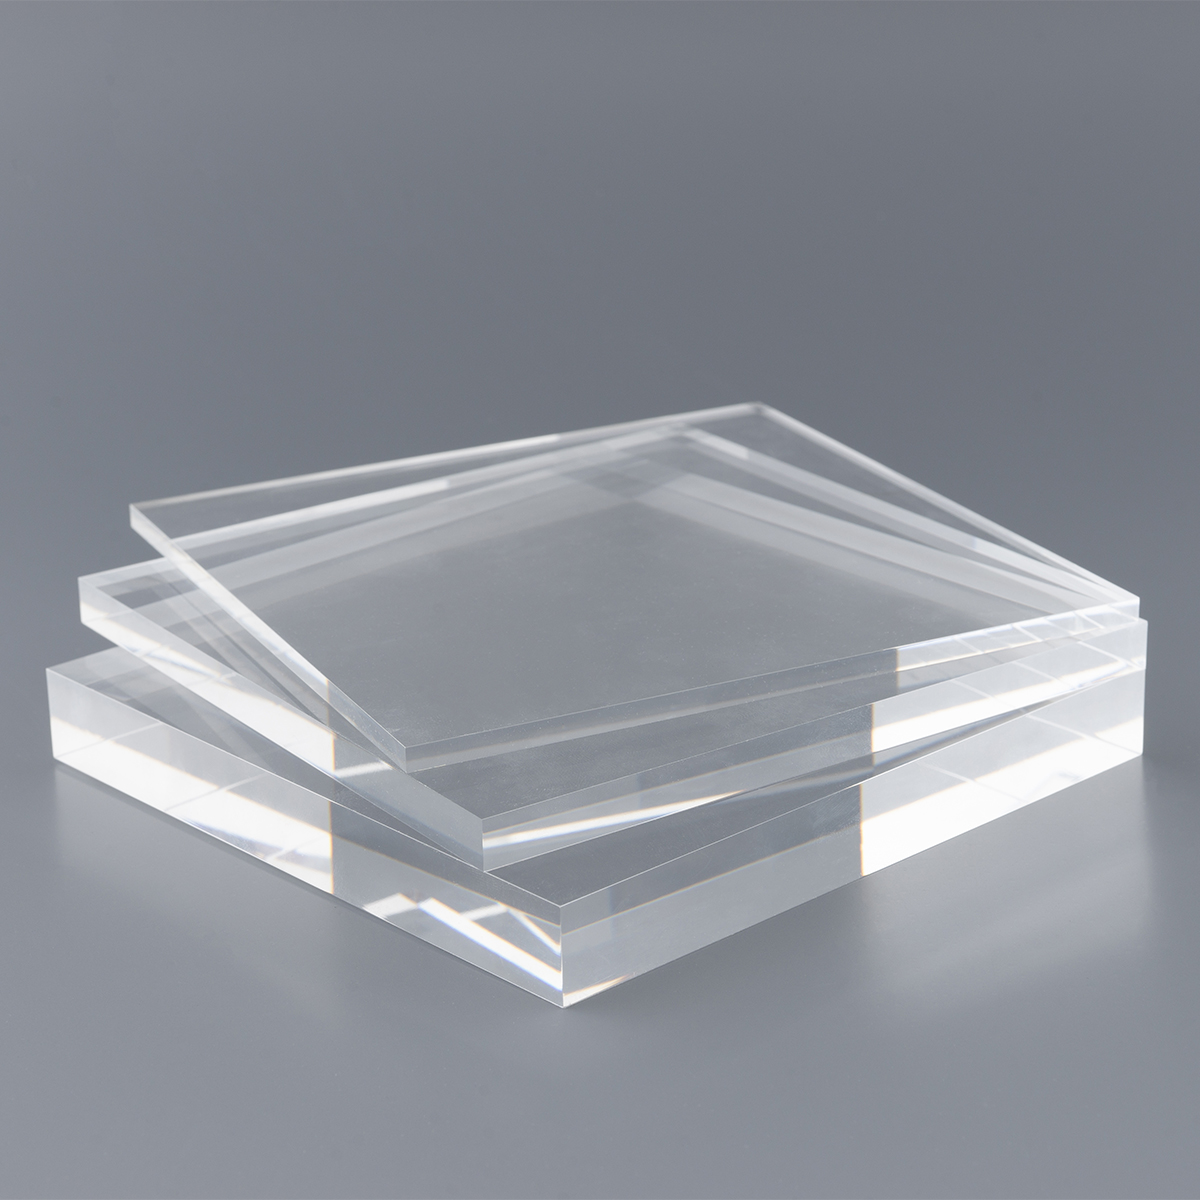 Clear Cast Perspex Acrylic Blocks Plastic Stockist